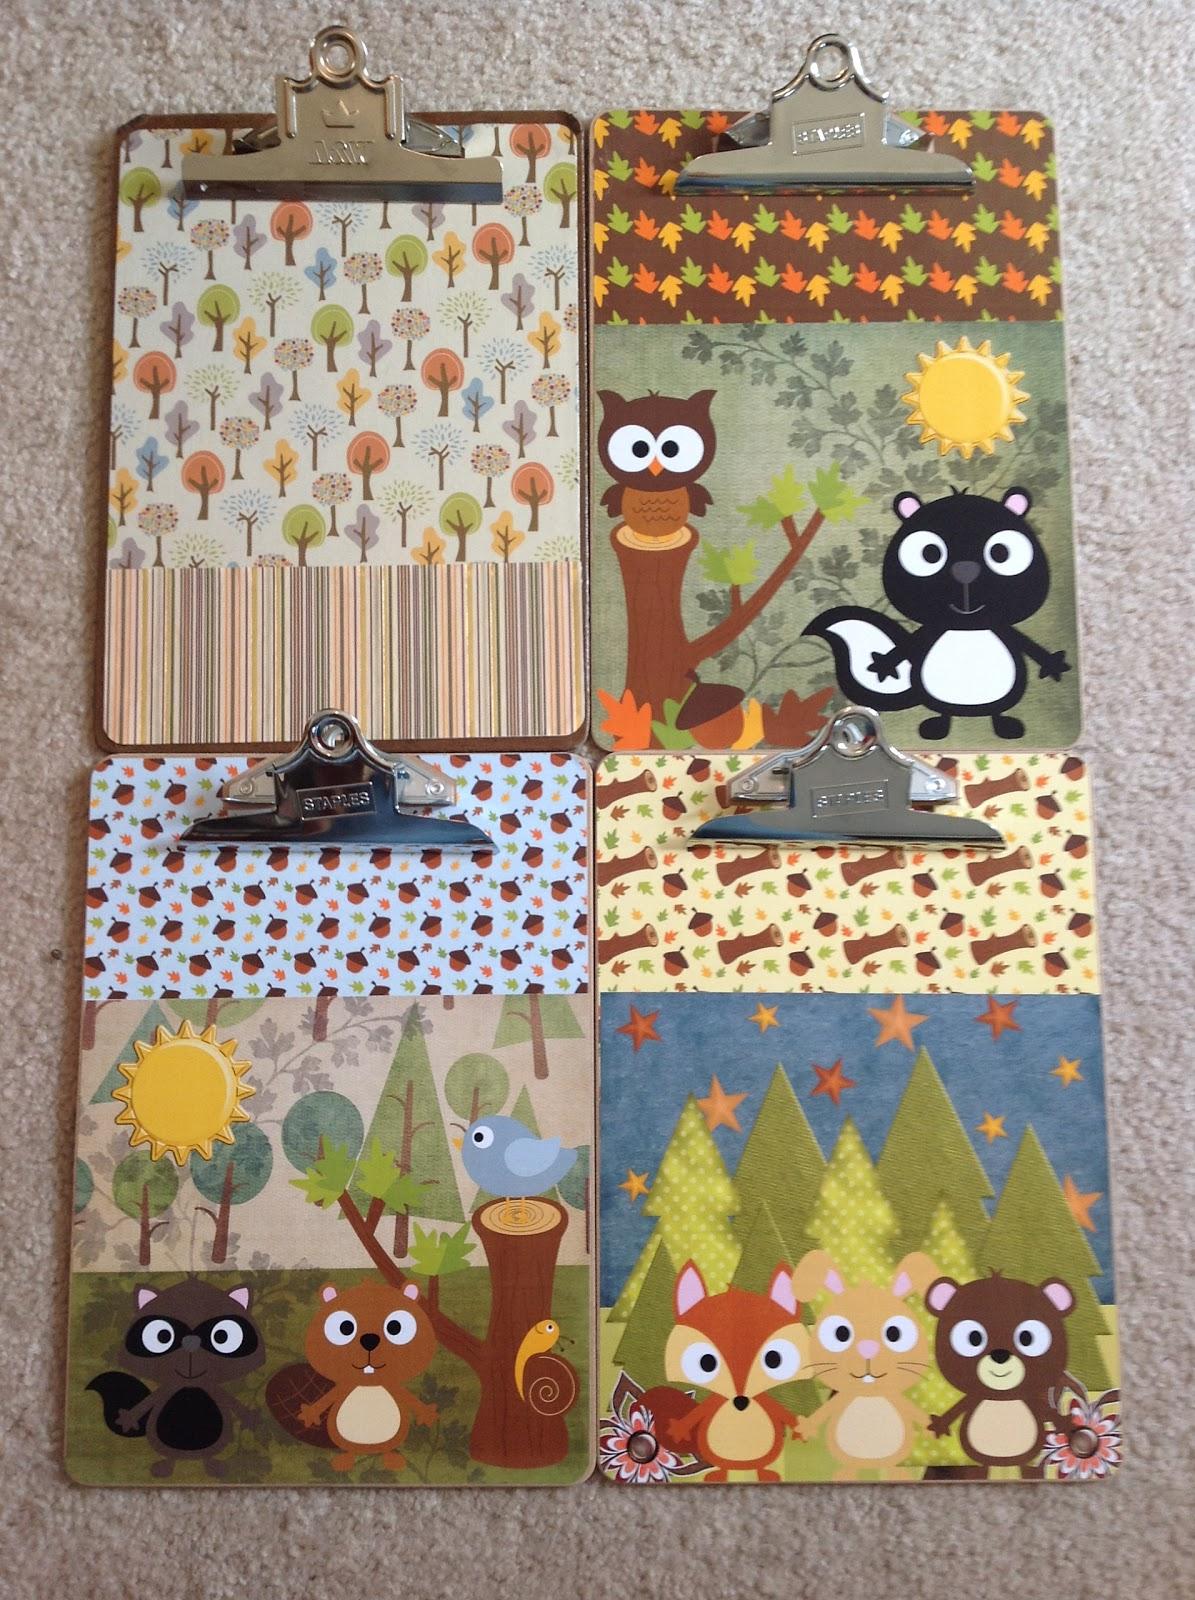 Decorative Clipboards For The Teacher